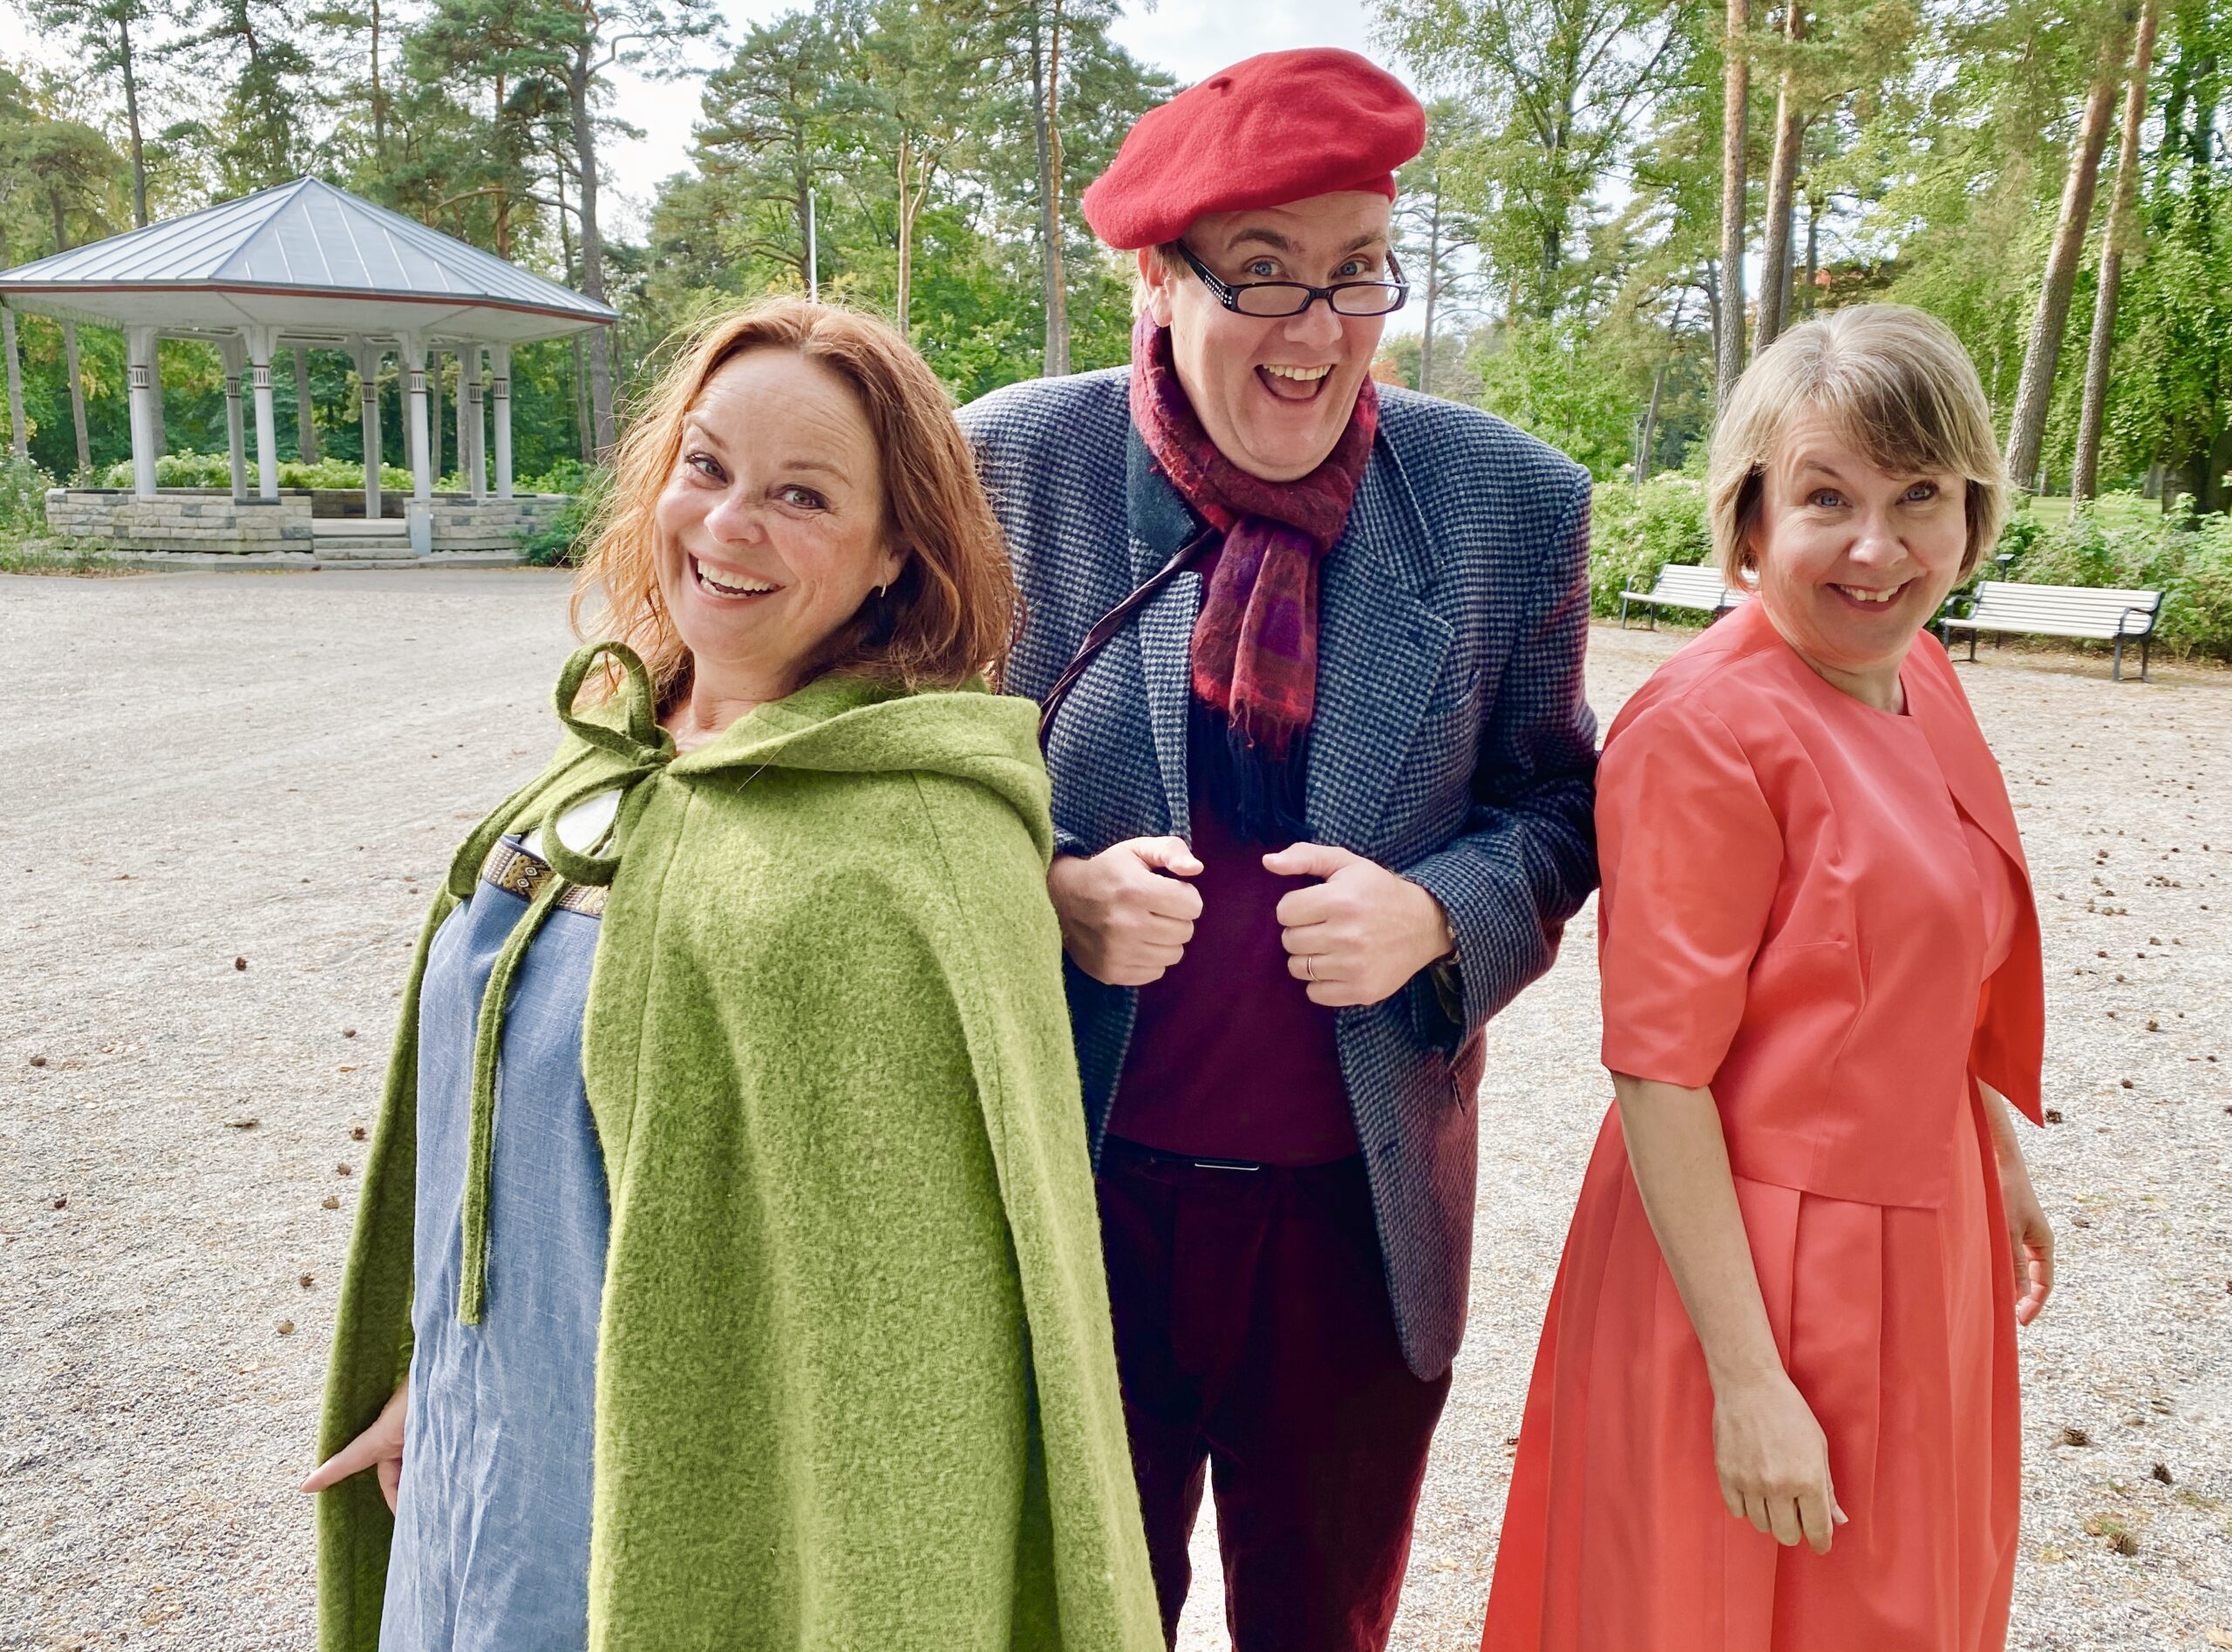 Hilde Bateman, Knut-Erik Rønne o Anna-Boel Andersen foran paviljongen i Kulåsparken. Foto.